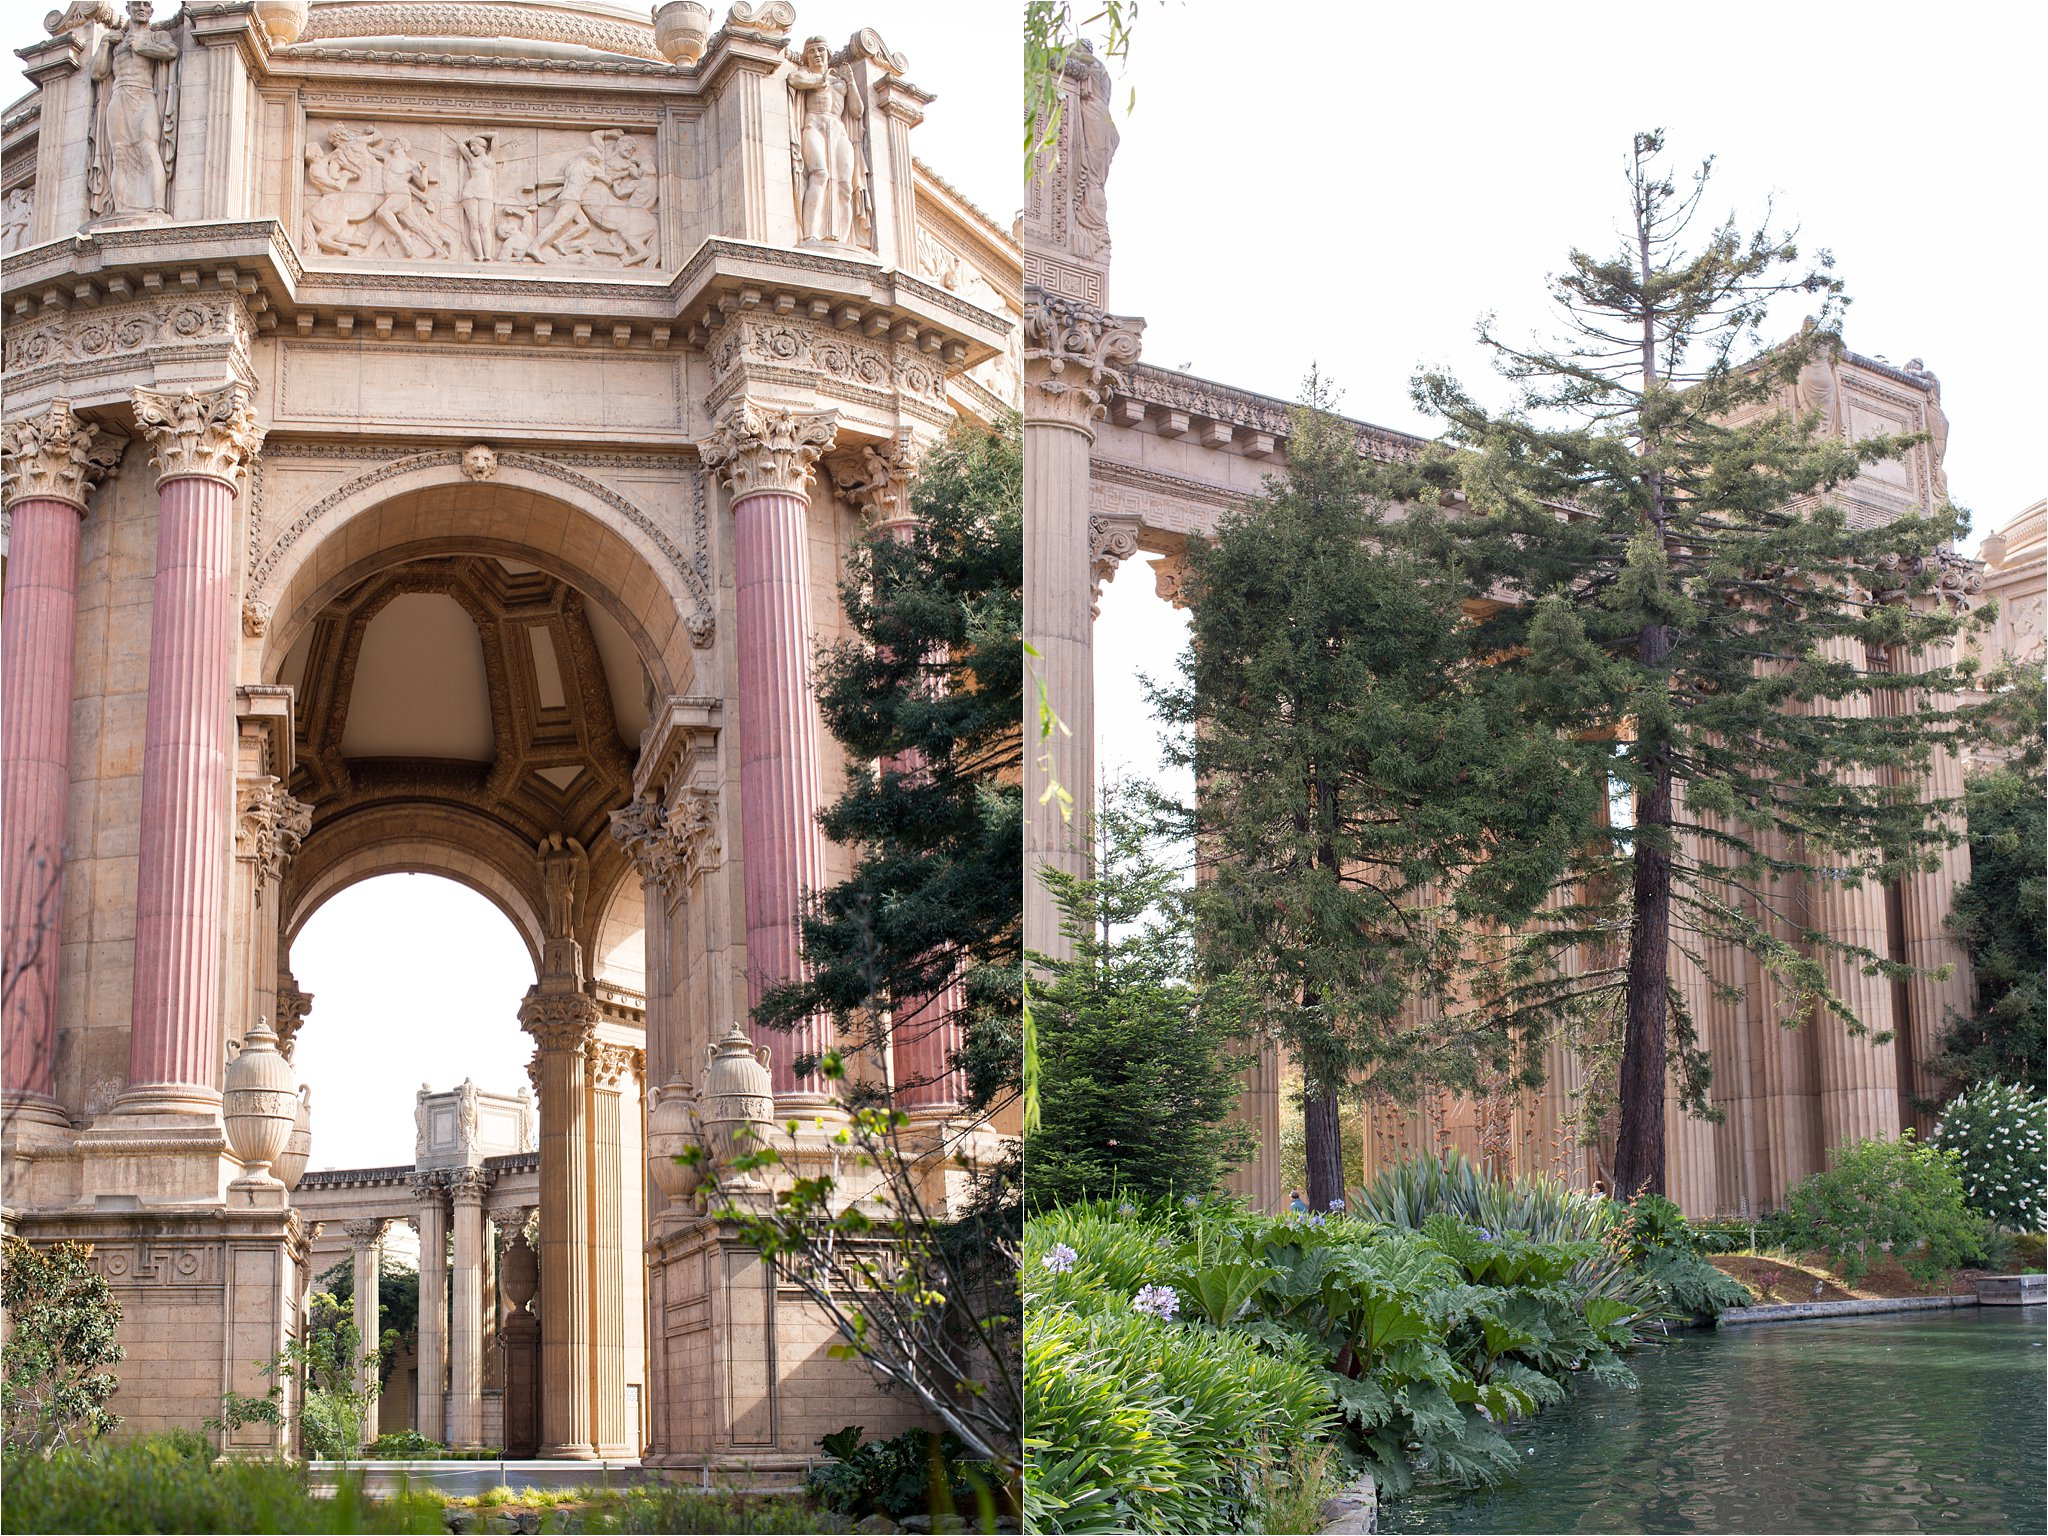 Palace of Fine Arts and Cedar Tree